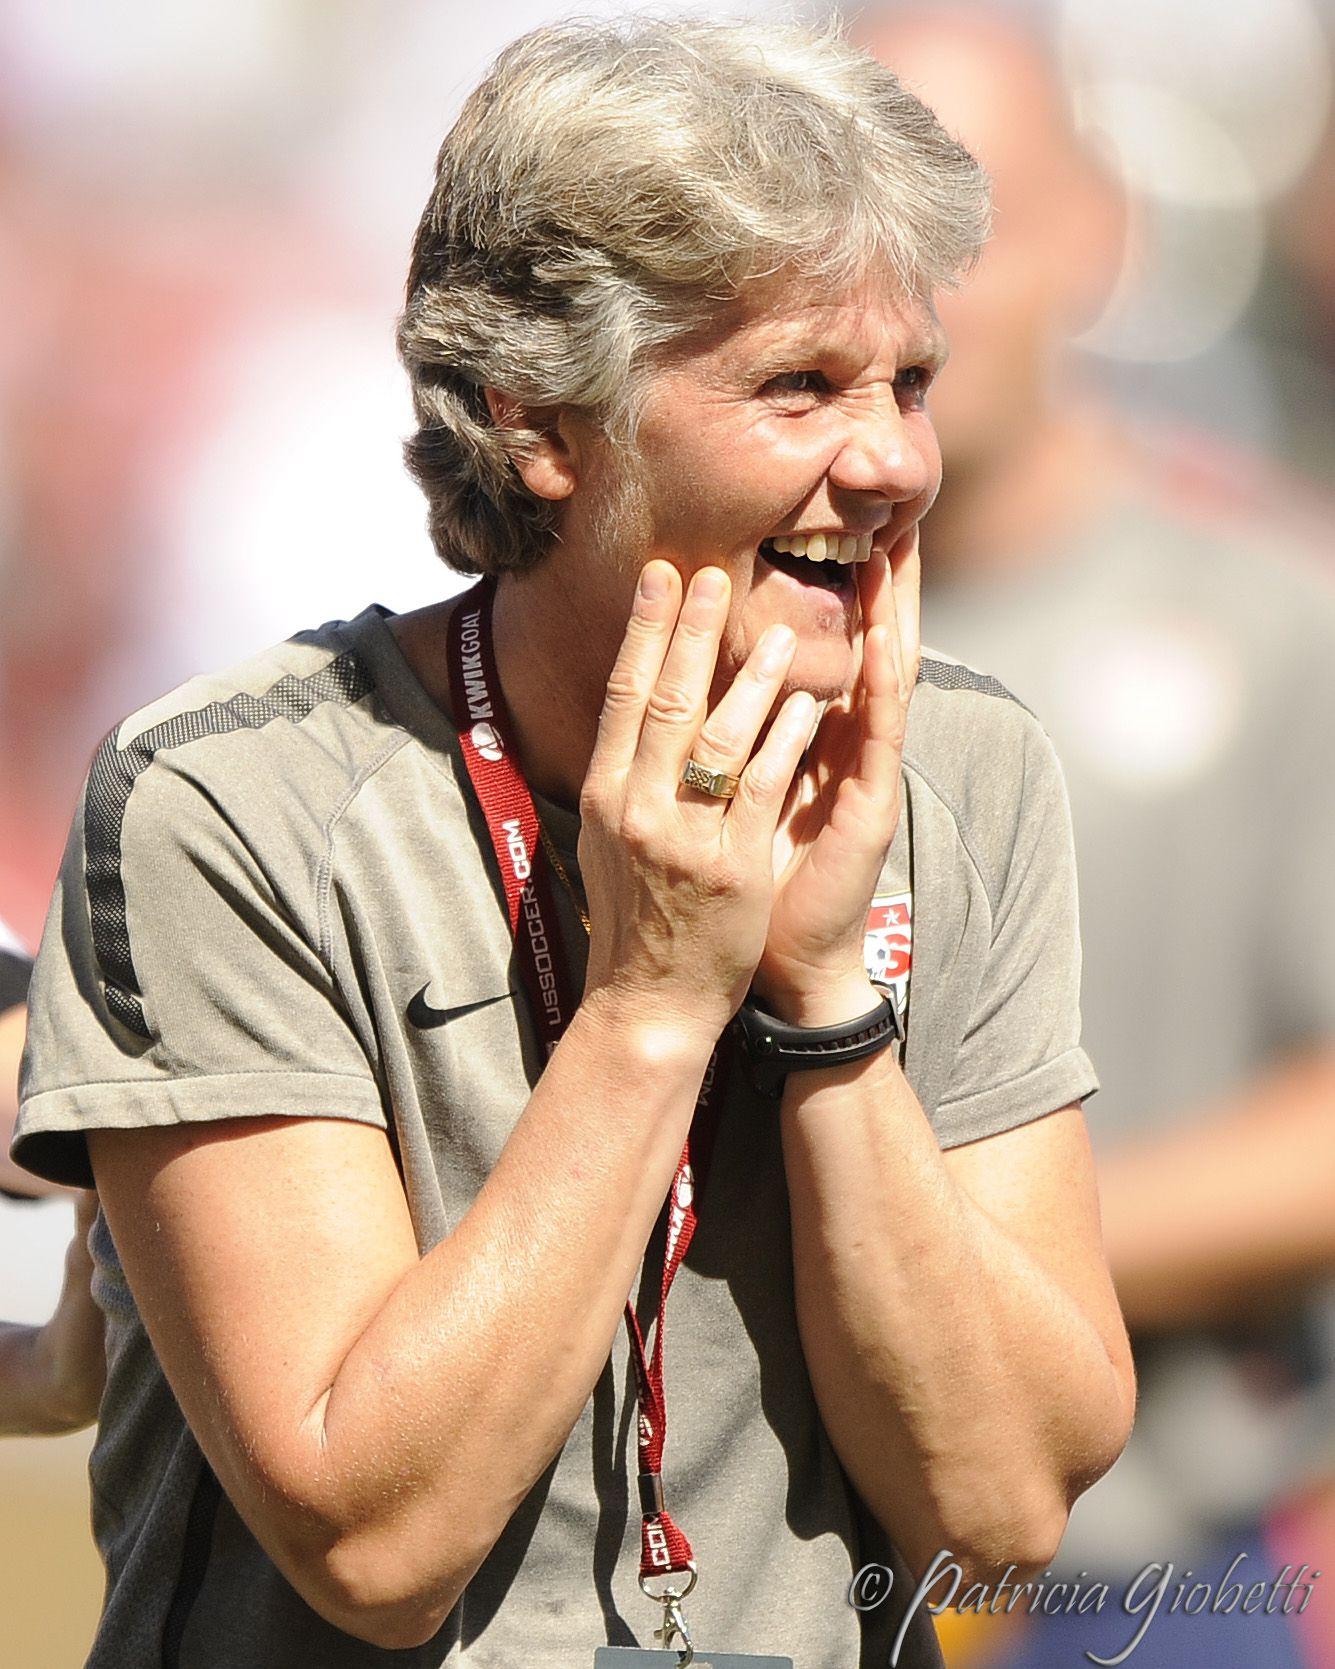 Pia Sundhage Swedish Soccer Coach Who Won Olympic Gold With Usa